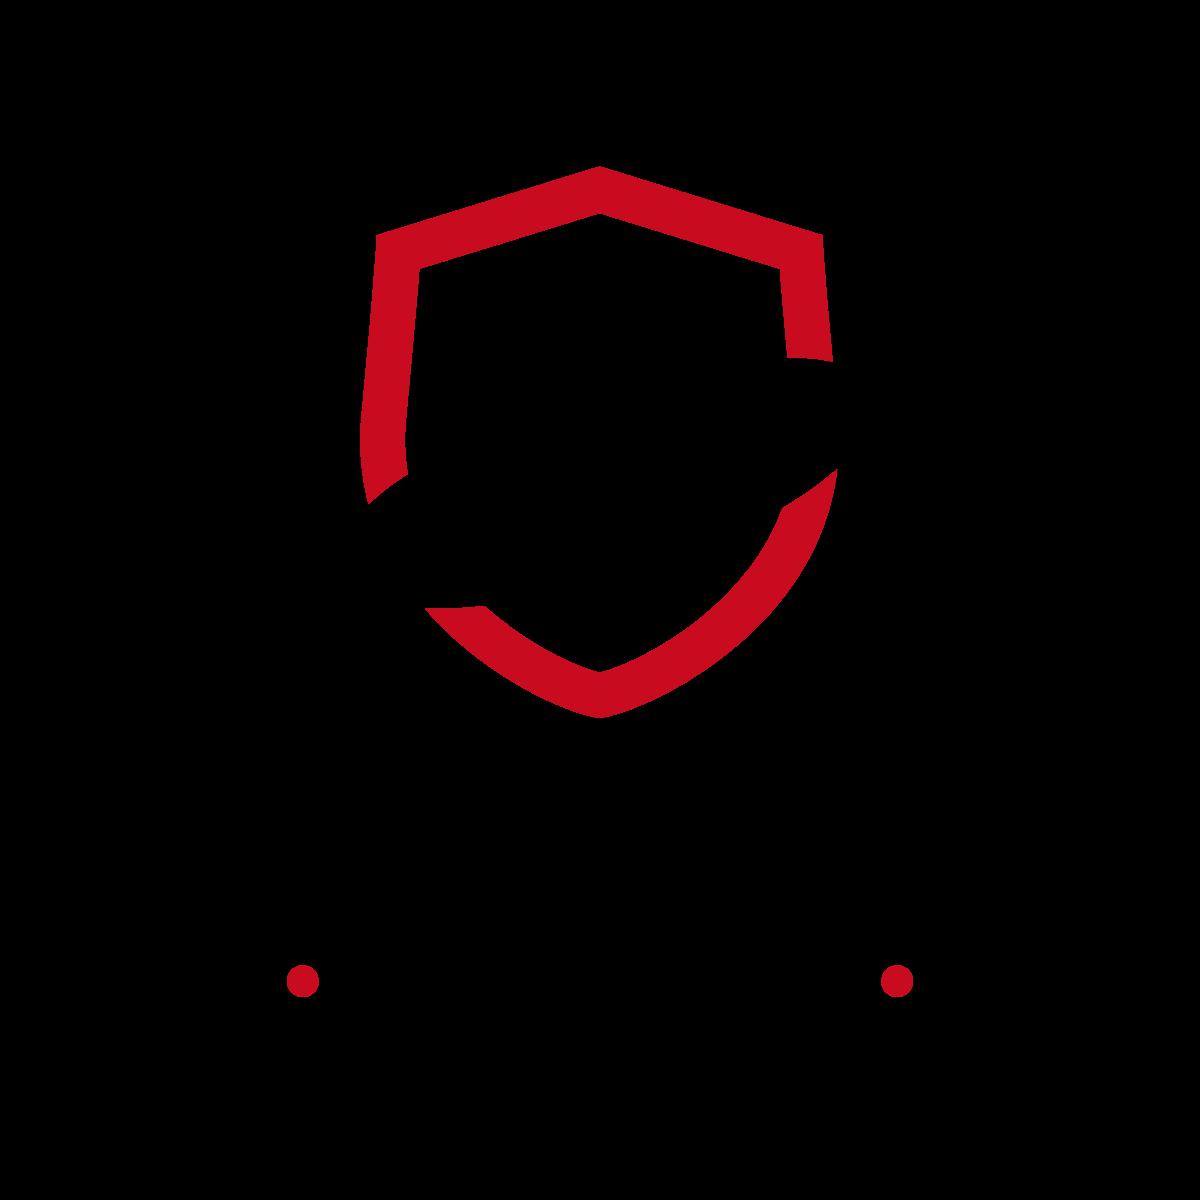 Logo for new division